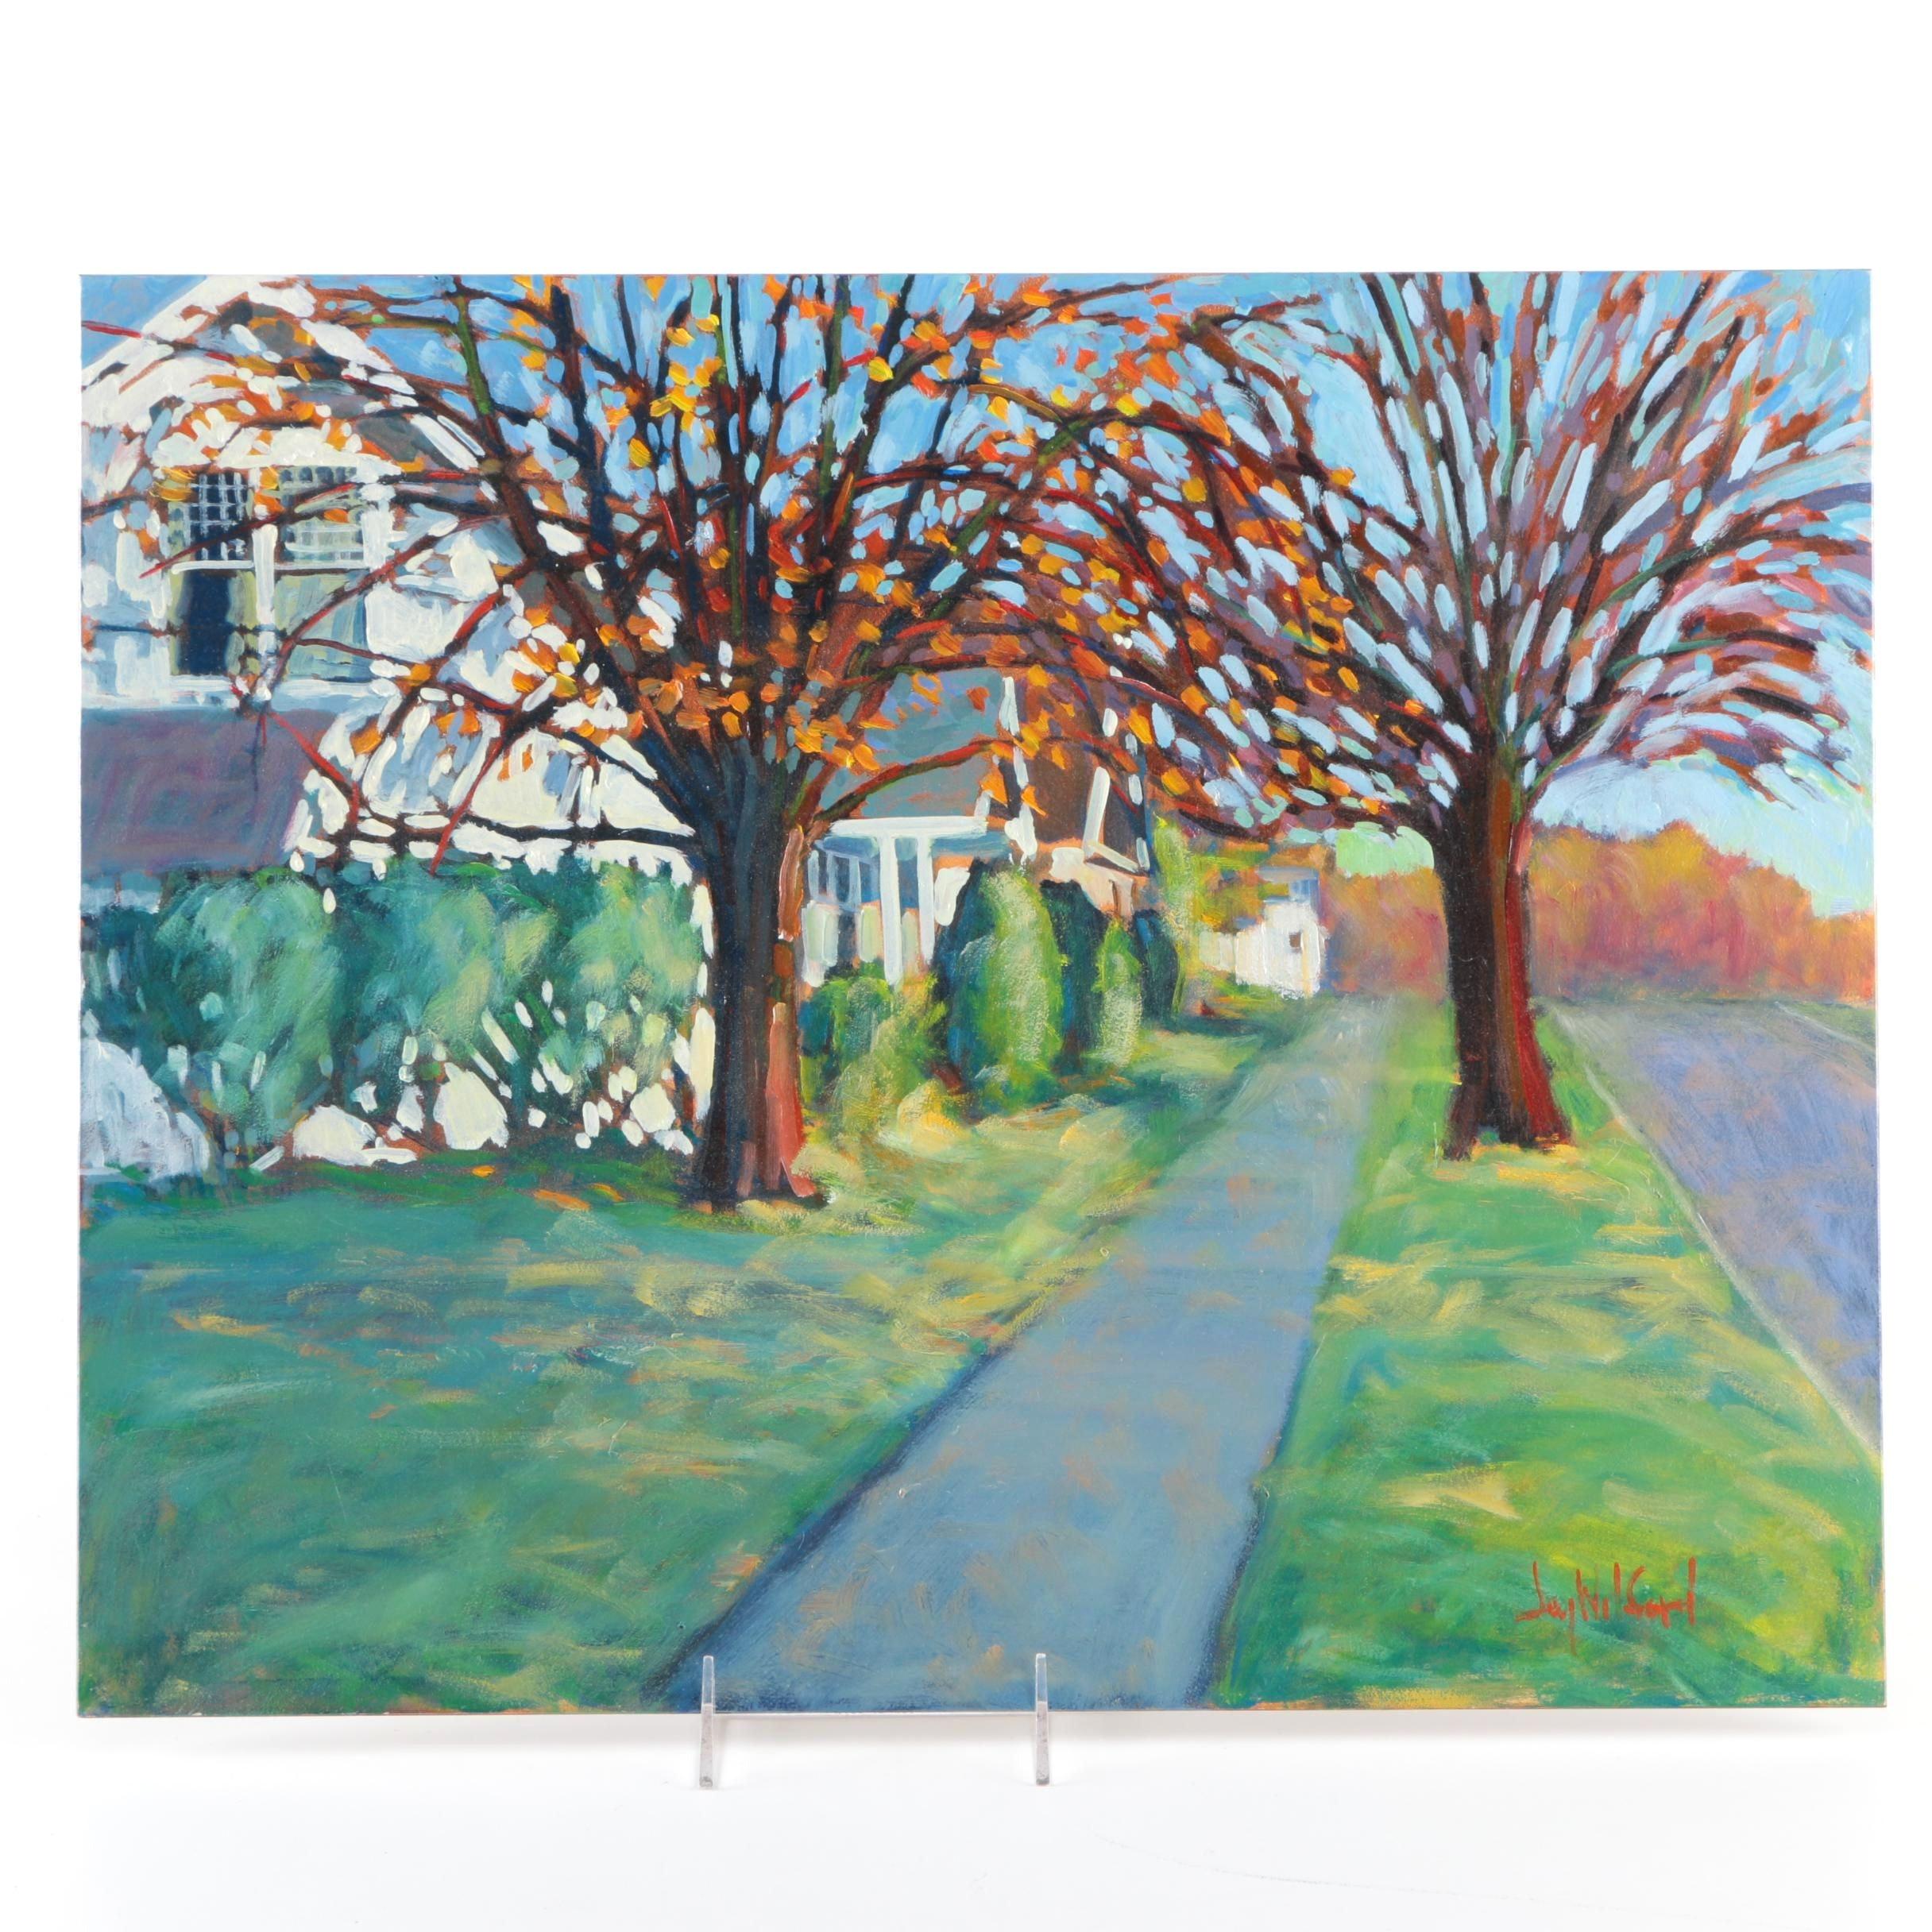 Jay Wilford Oil Painting on Claybord of Suburban Scene